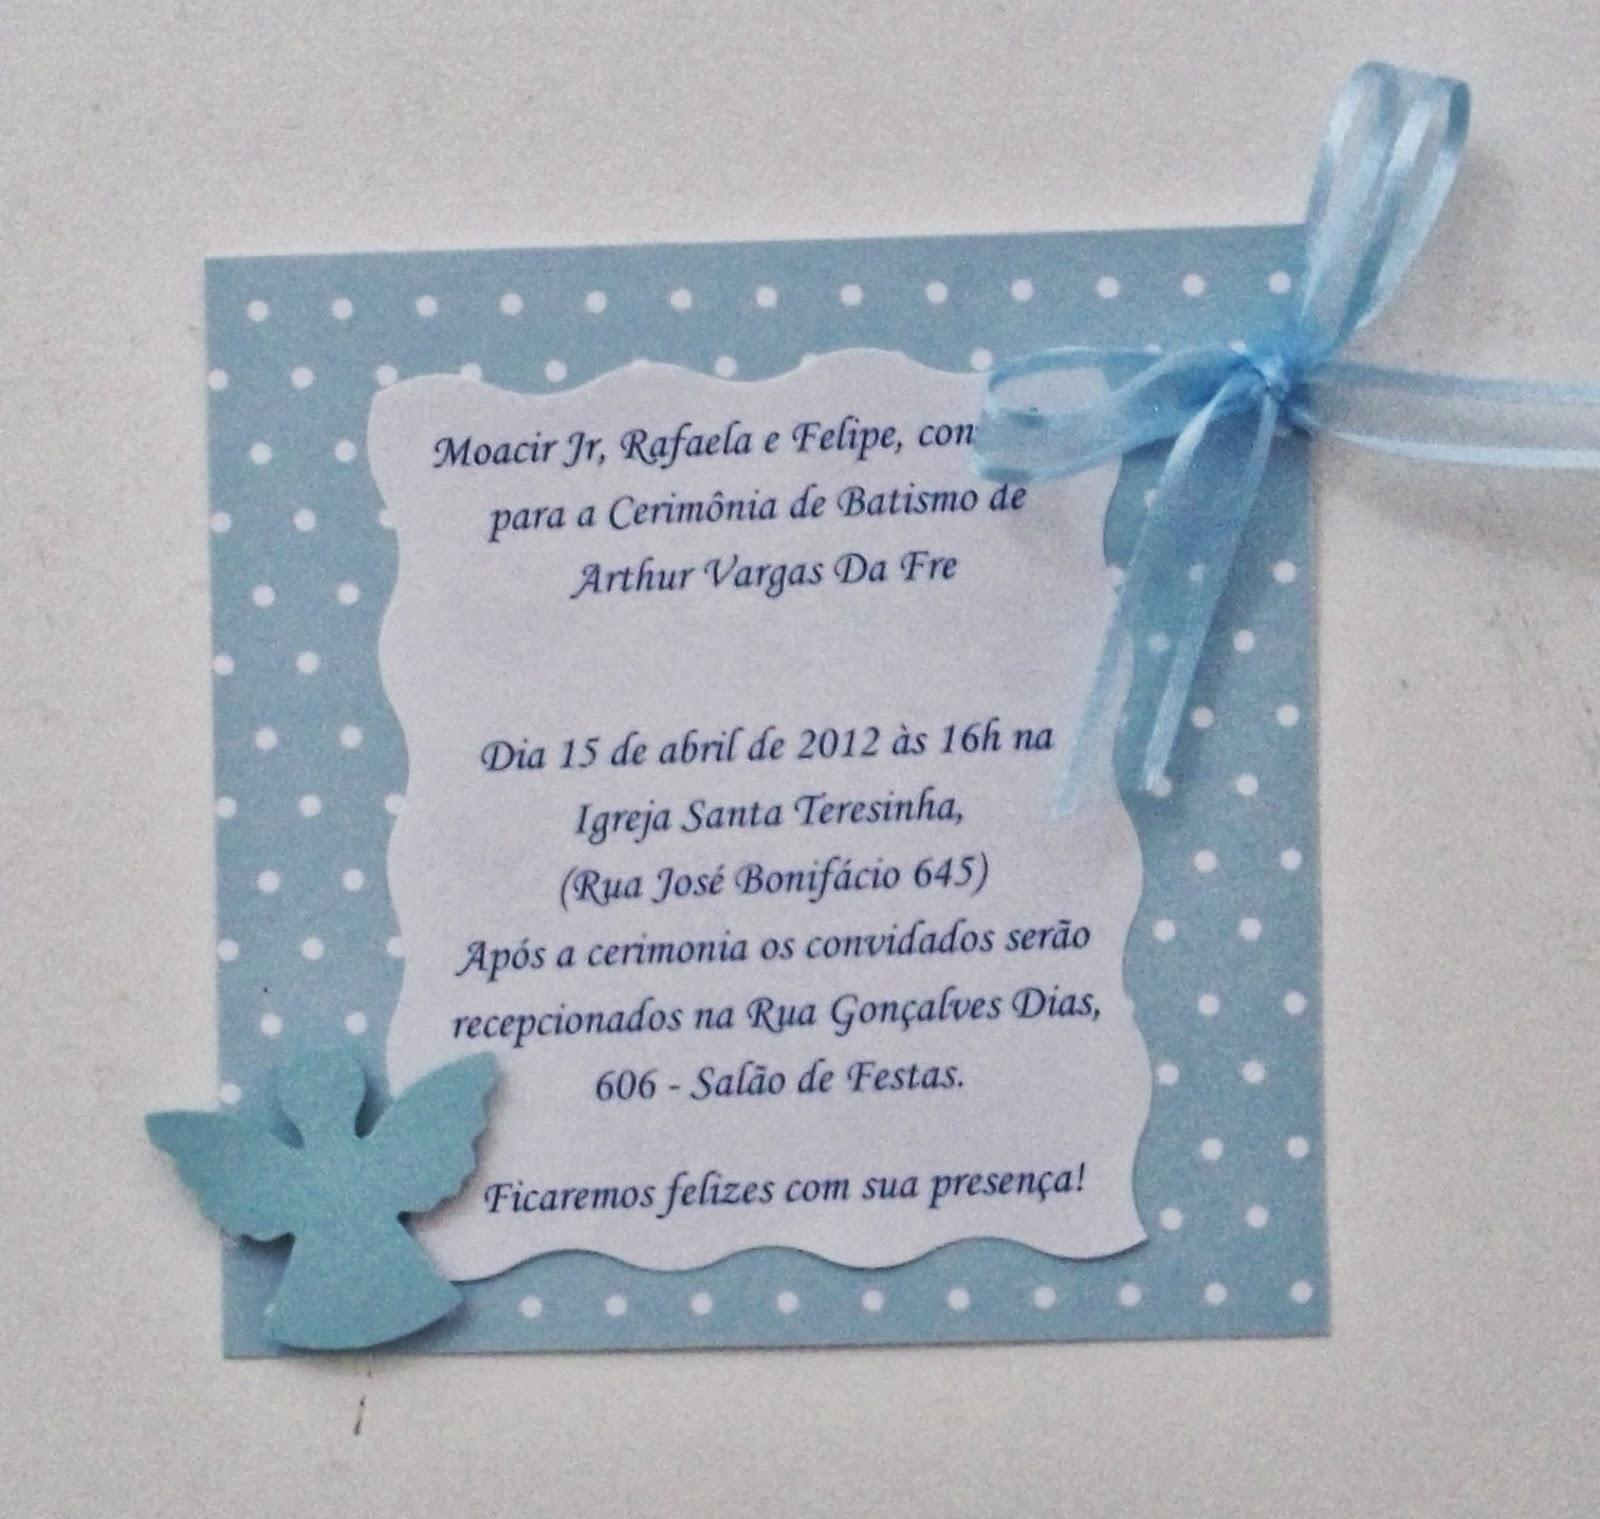 Convites para batizado papeleira maluca altavistaventures Gallery